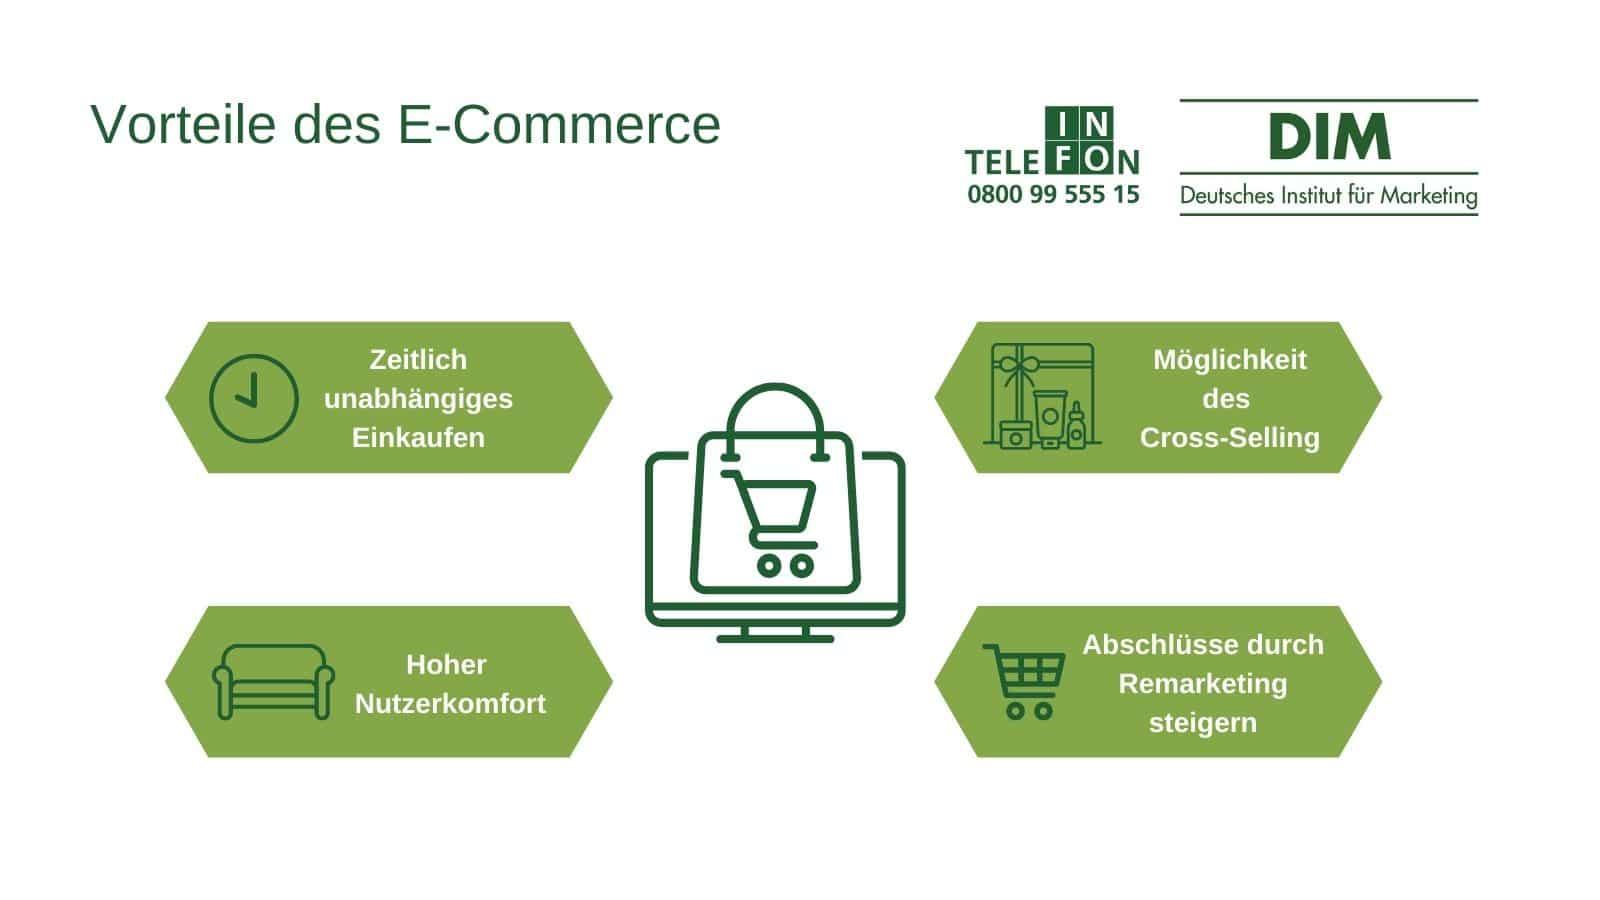 E-Commerce Vorteile